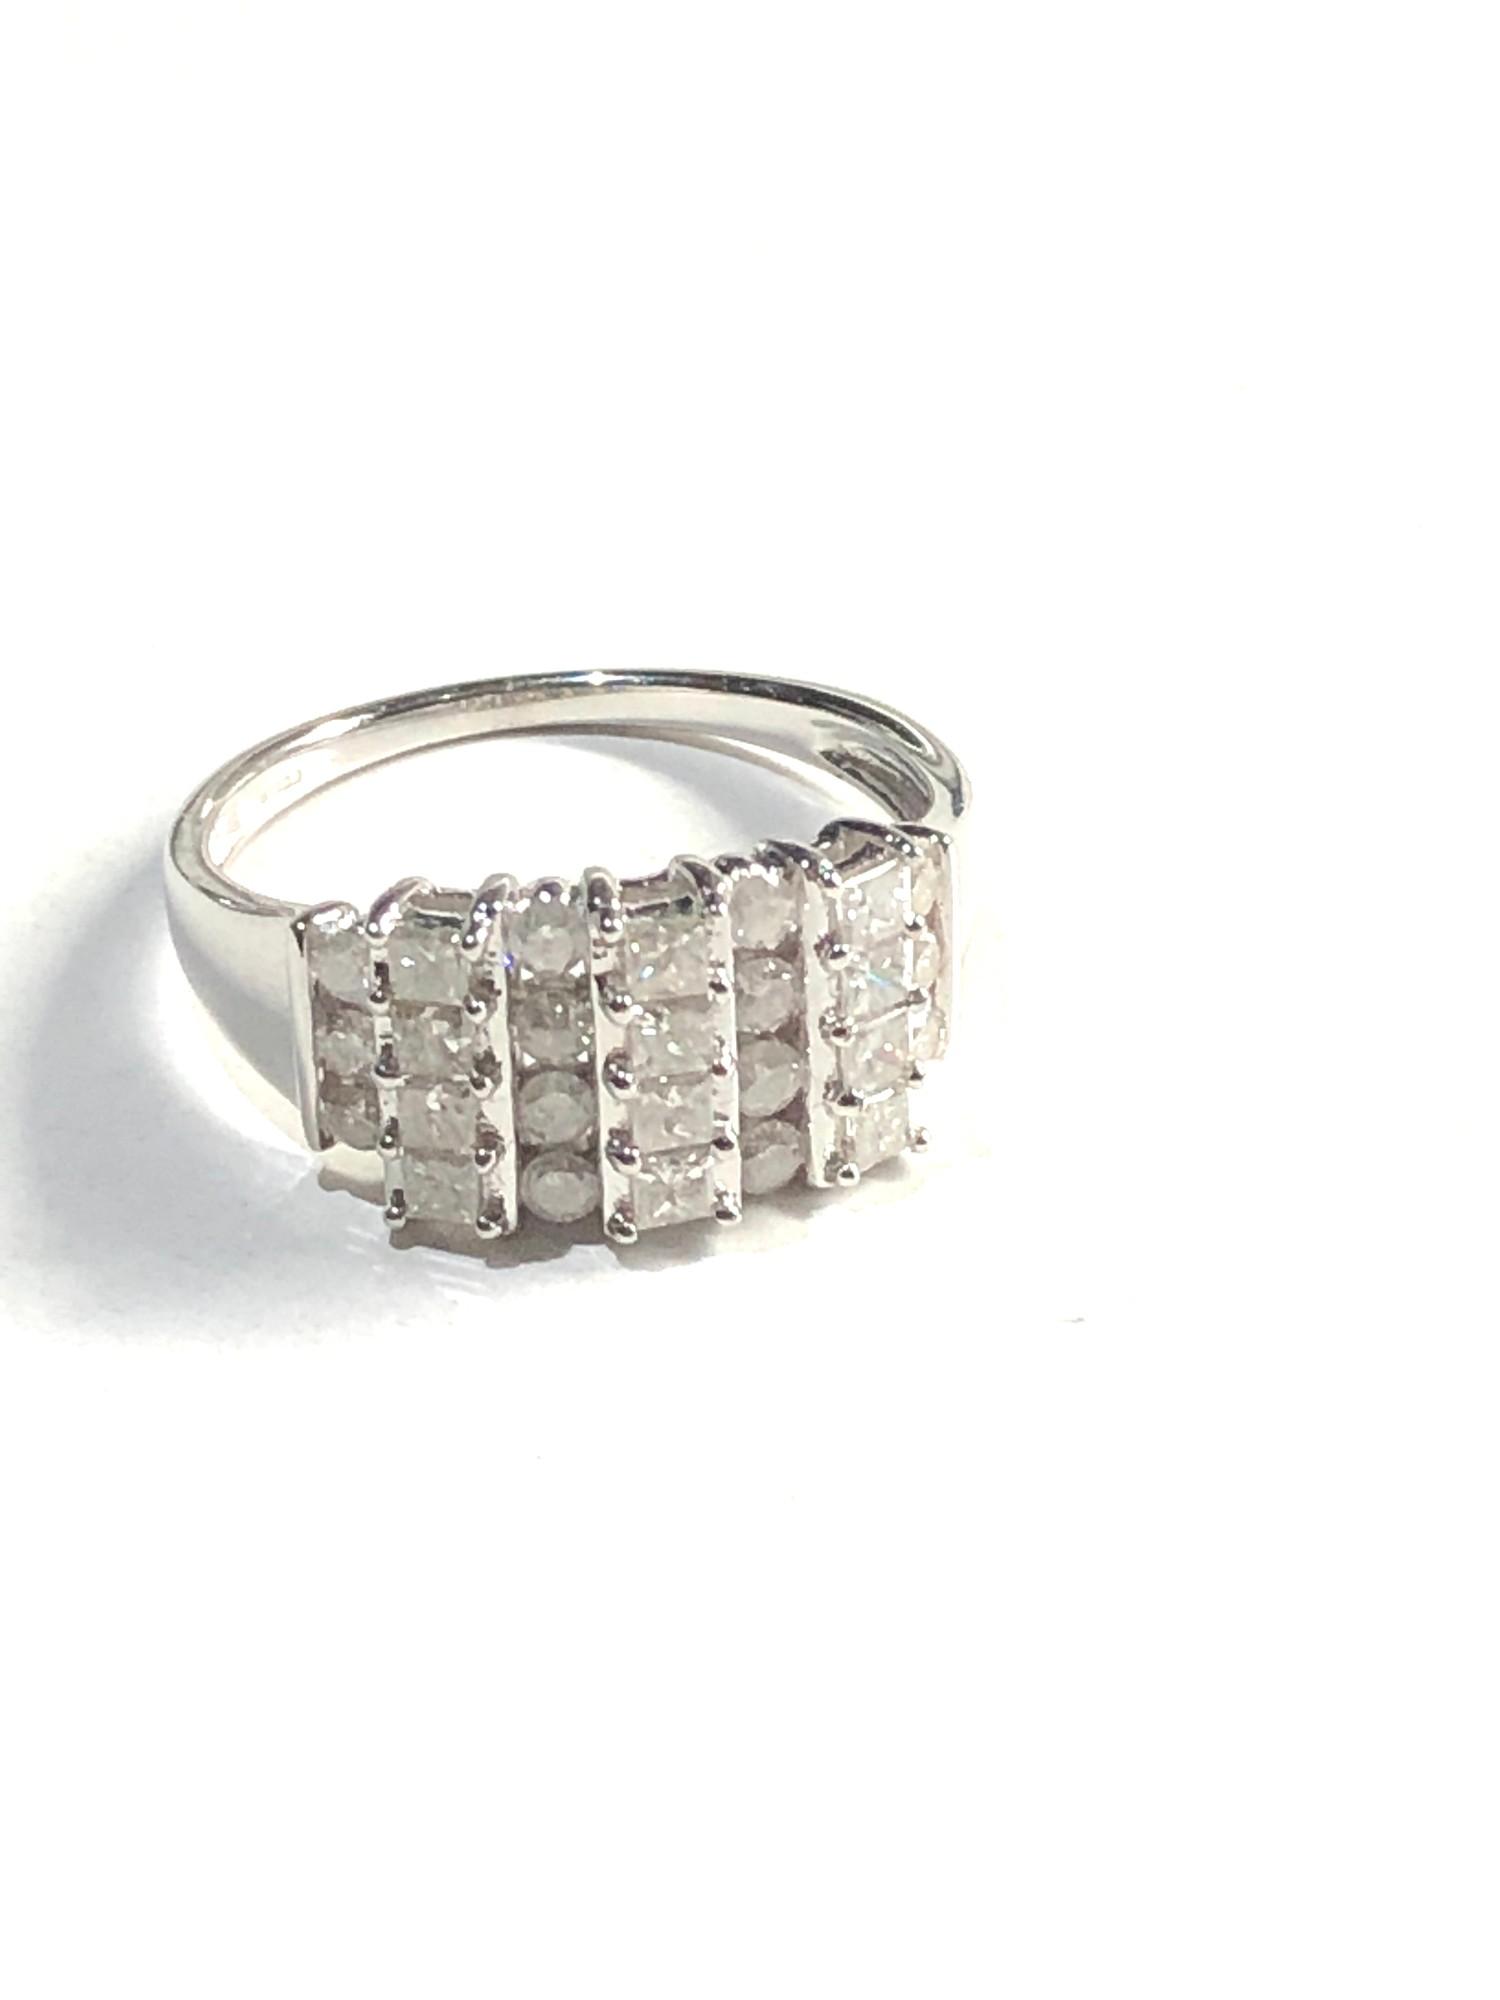 9ct white gold diamond cluster ring 3.7g